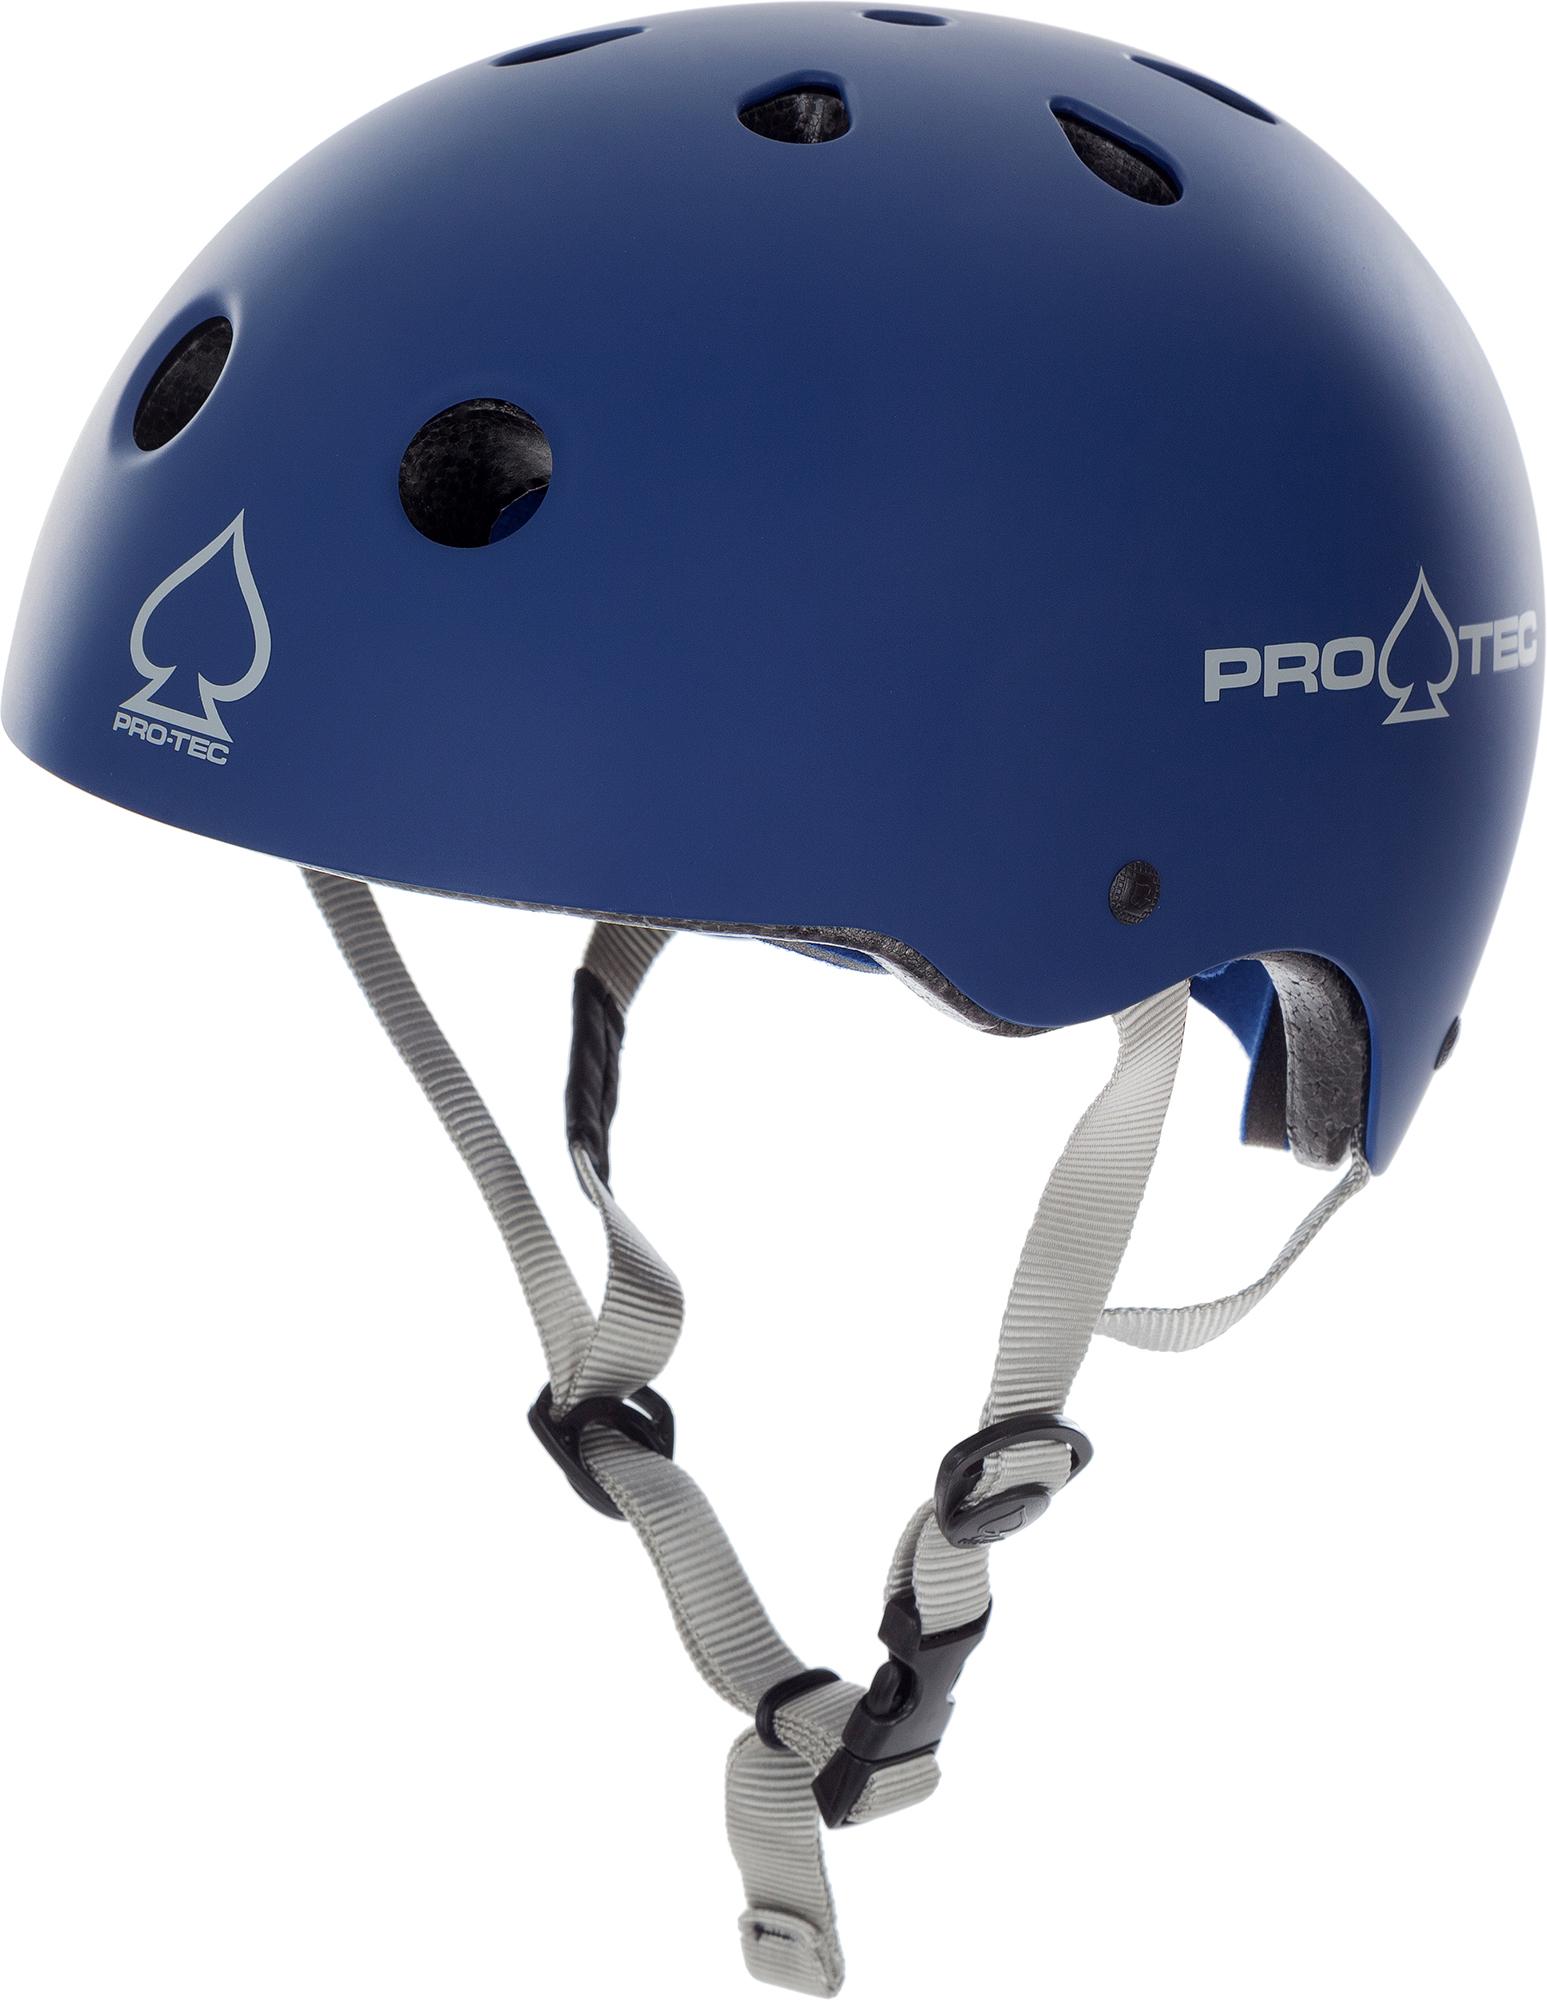 Pro-Tec Шлем Pro-Tec Classic Cert Matte, размер 58-60 epiphone pro 1 classic